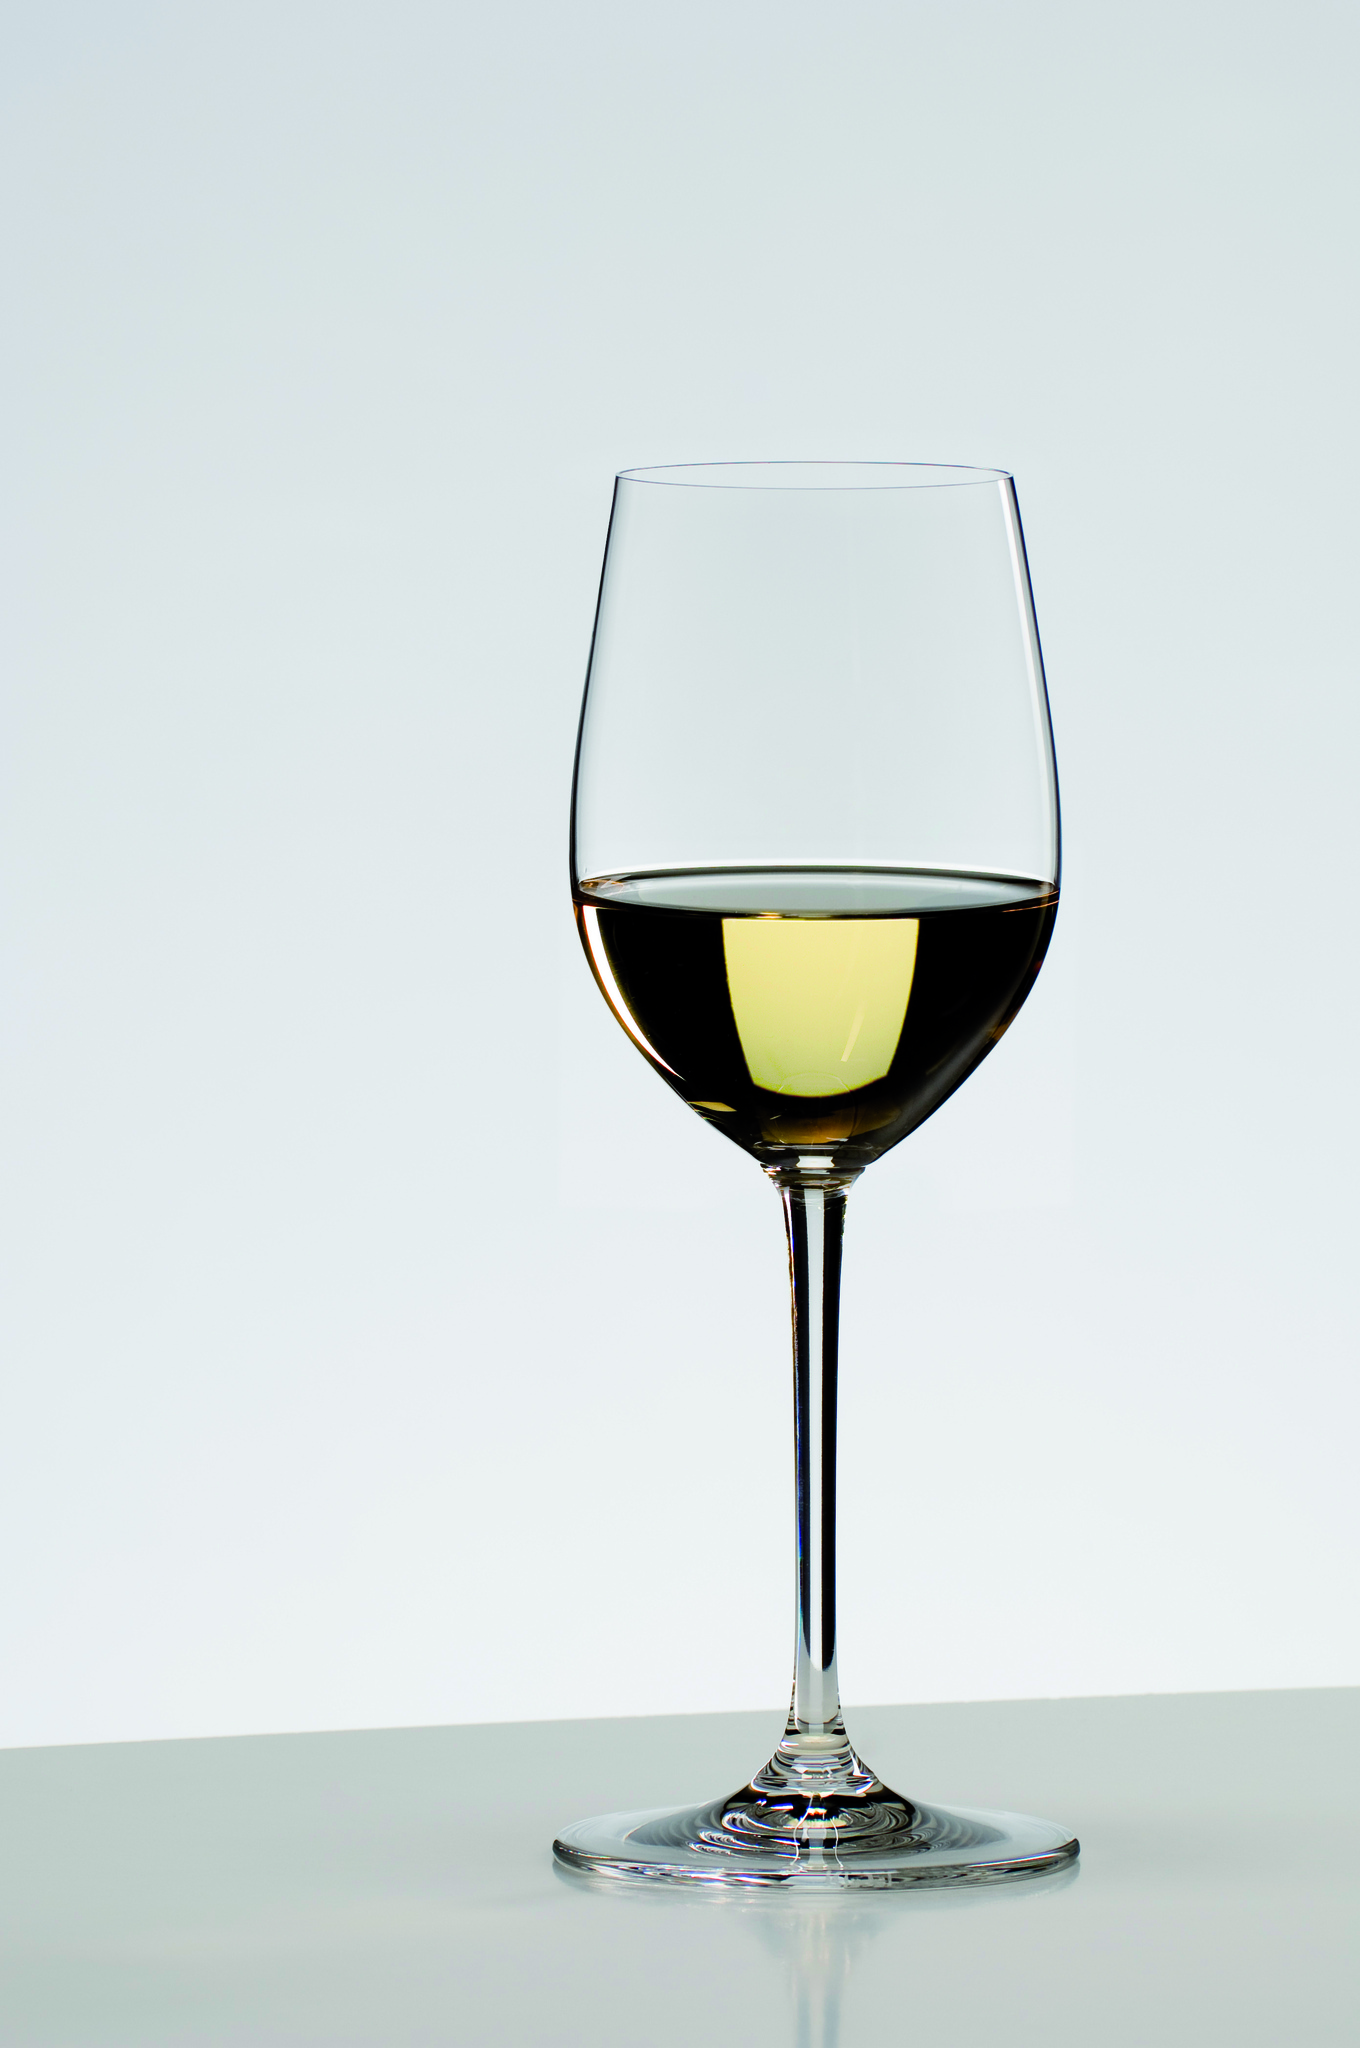 Бокалы Набор бокалов для белого вина 2шт 370мл Riedel Vinum XL Chardonnay/Viognier nabor-bokalov-dlya-belogo-vina-2-sht-370-ml-riedel-vinum-xl-chardonnayviognier-avstriya.jpg